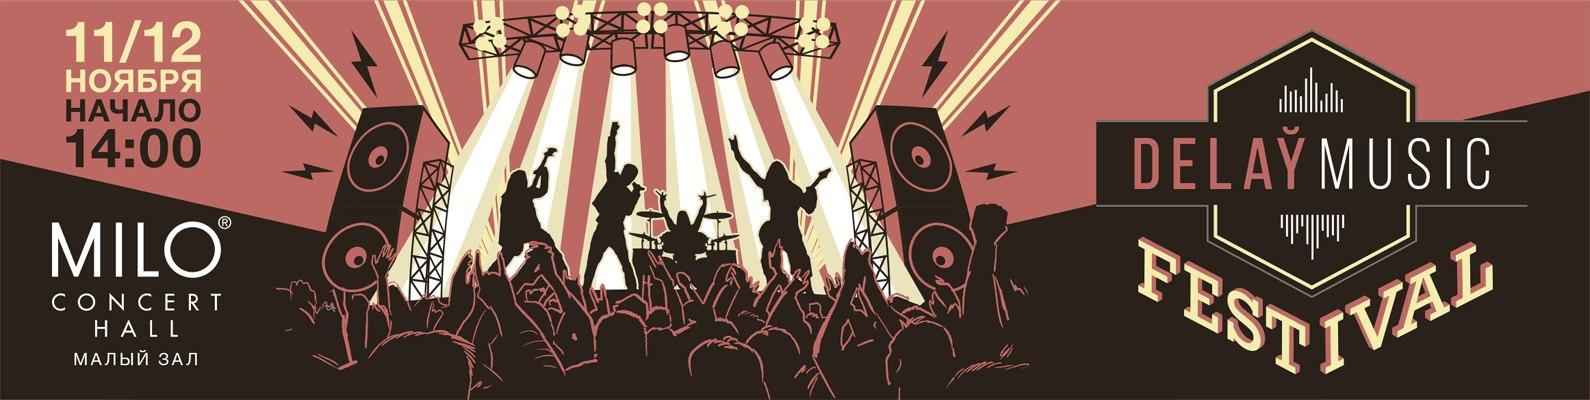 Delay Music Festival